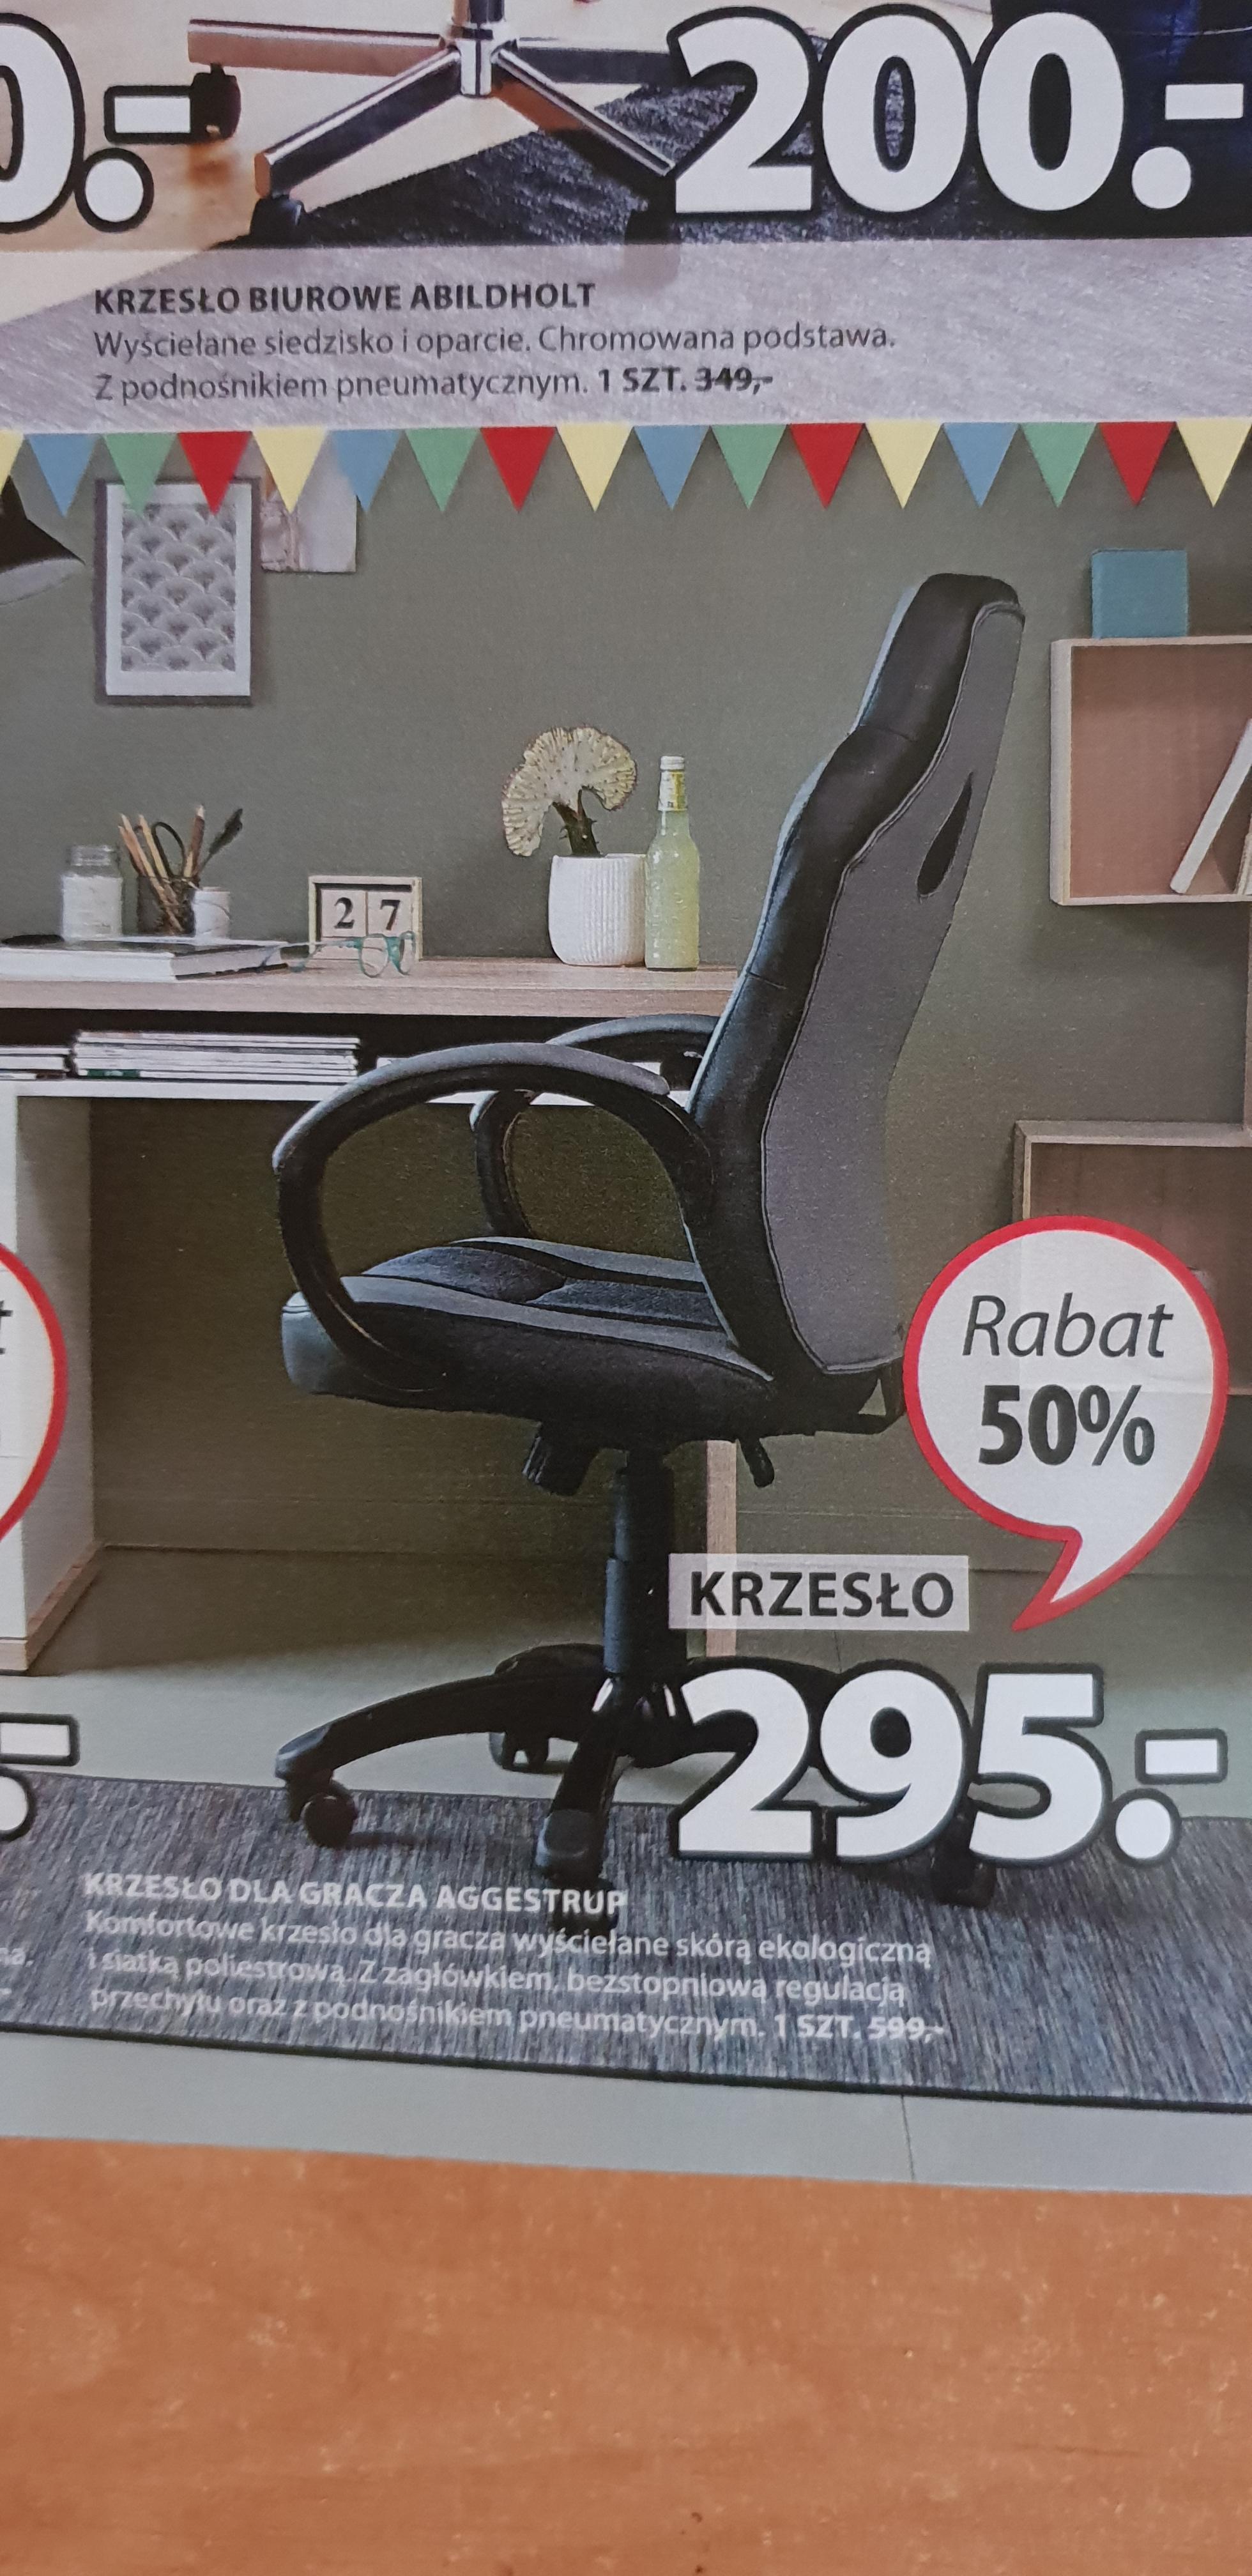 Fotel dla gracza aggestrup JYSK